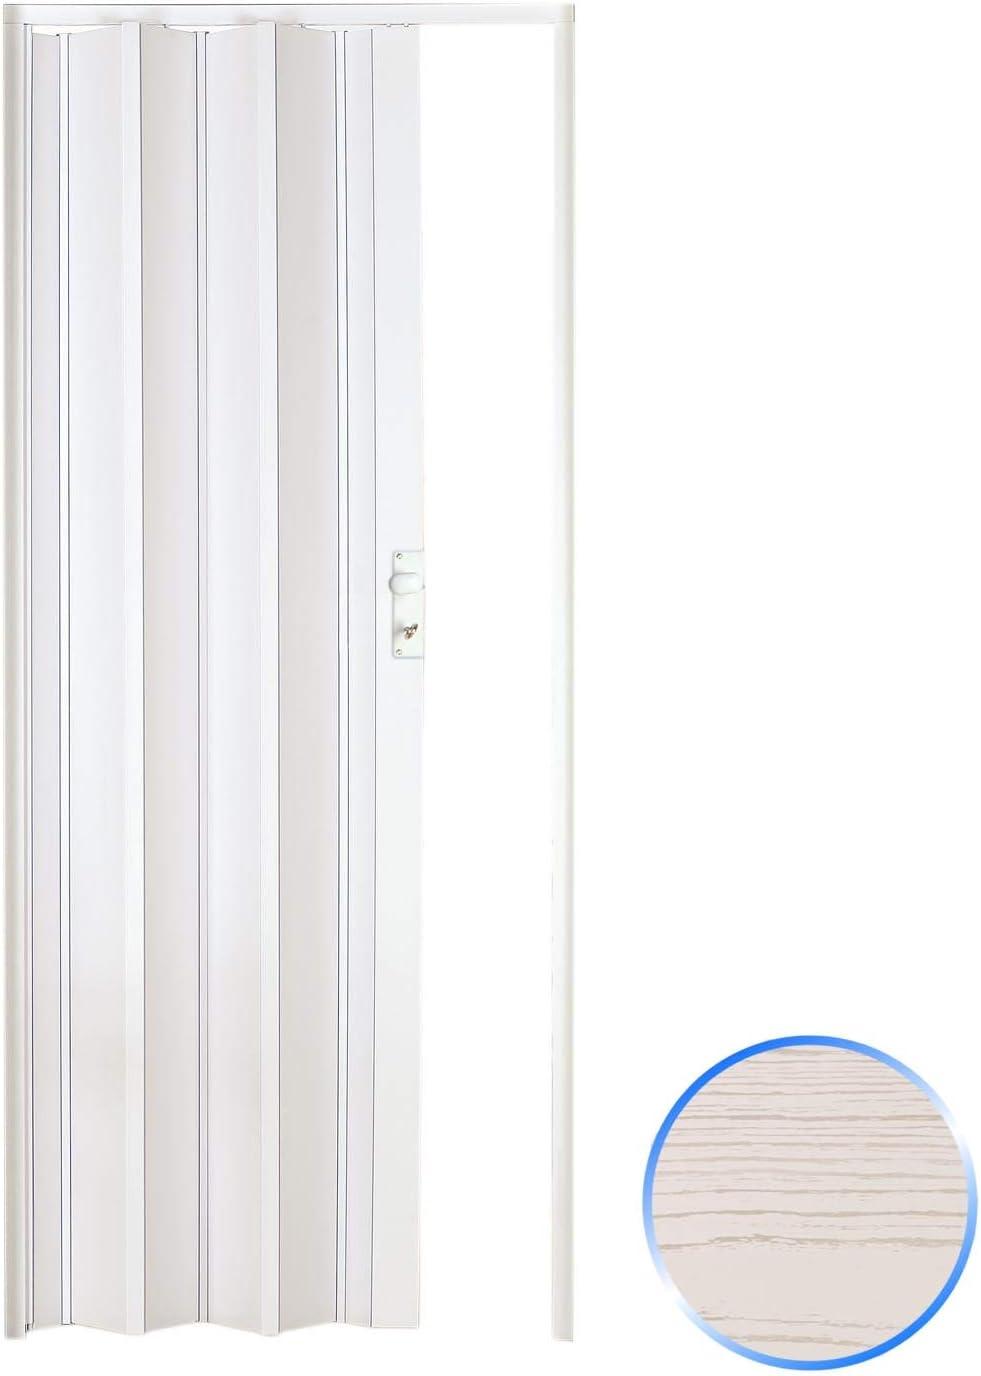 Forte Puerta Plegable de Interior de PVC Pino Blanco 88,5x214 cm Mod.Luciana